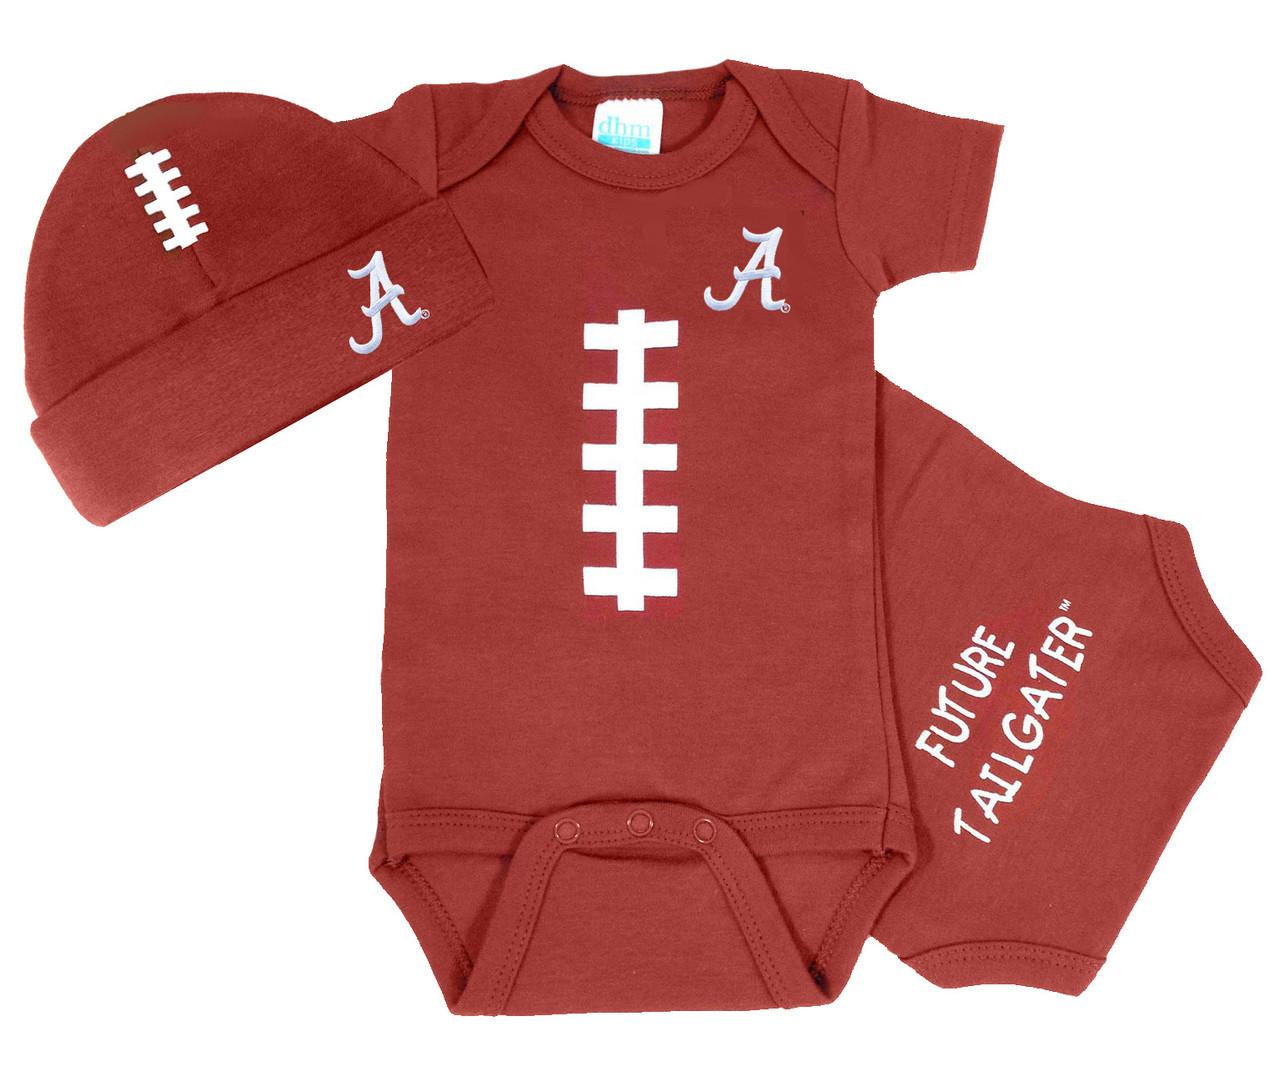 Alabama Crimson Tide Football Onesie and Football Hat Baby Gift Set b552448403f